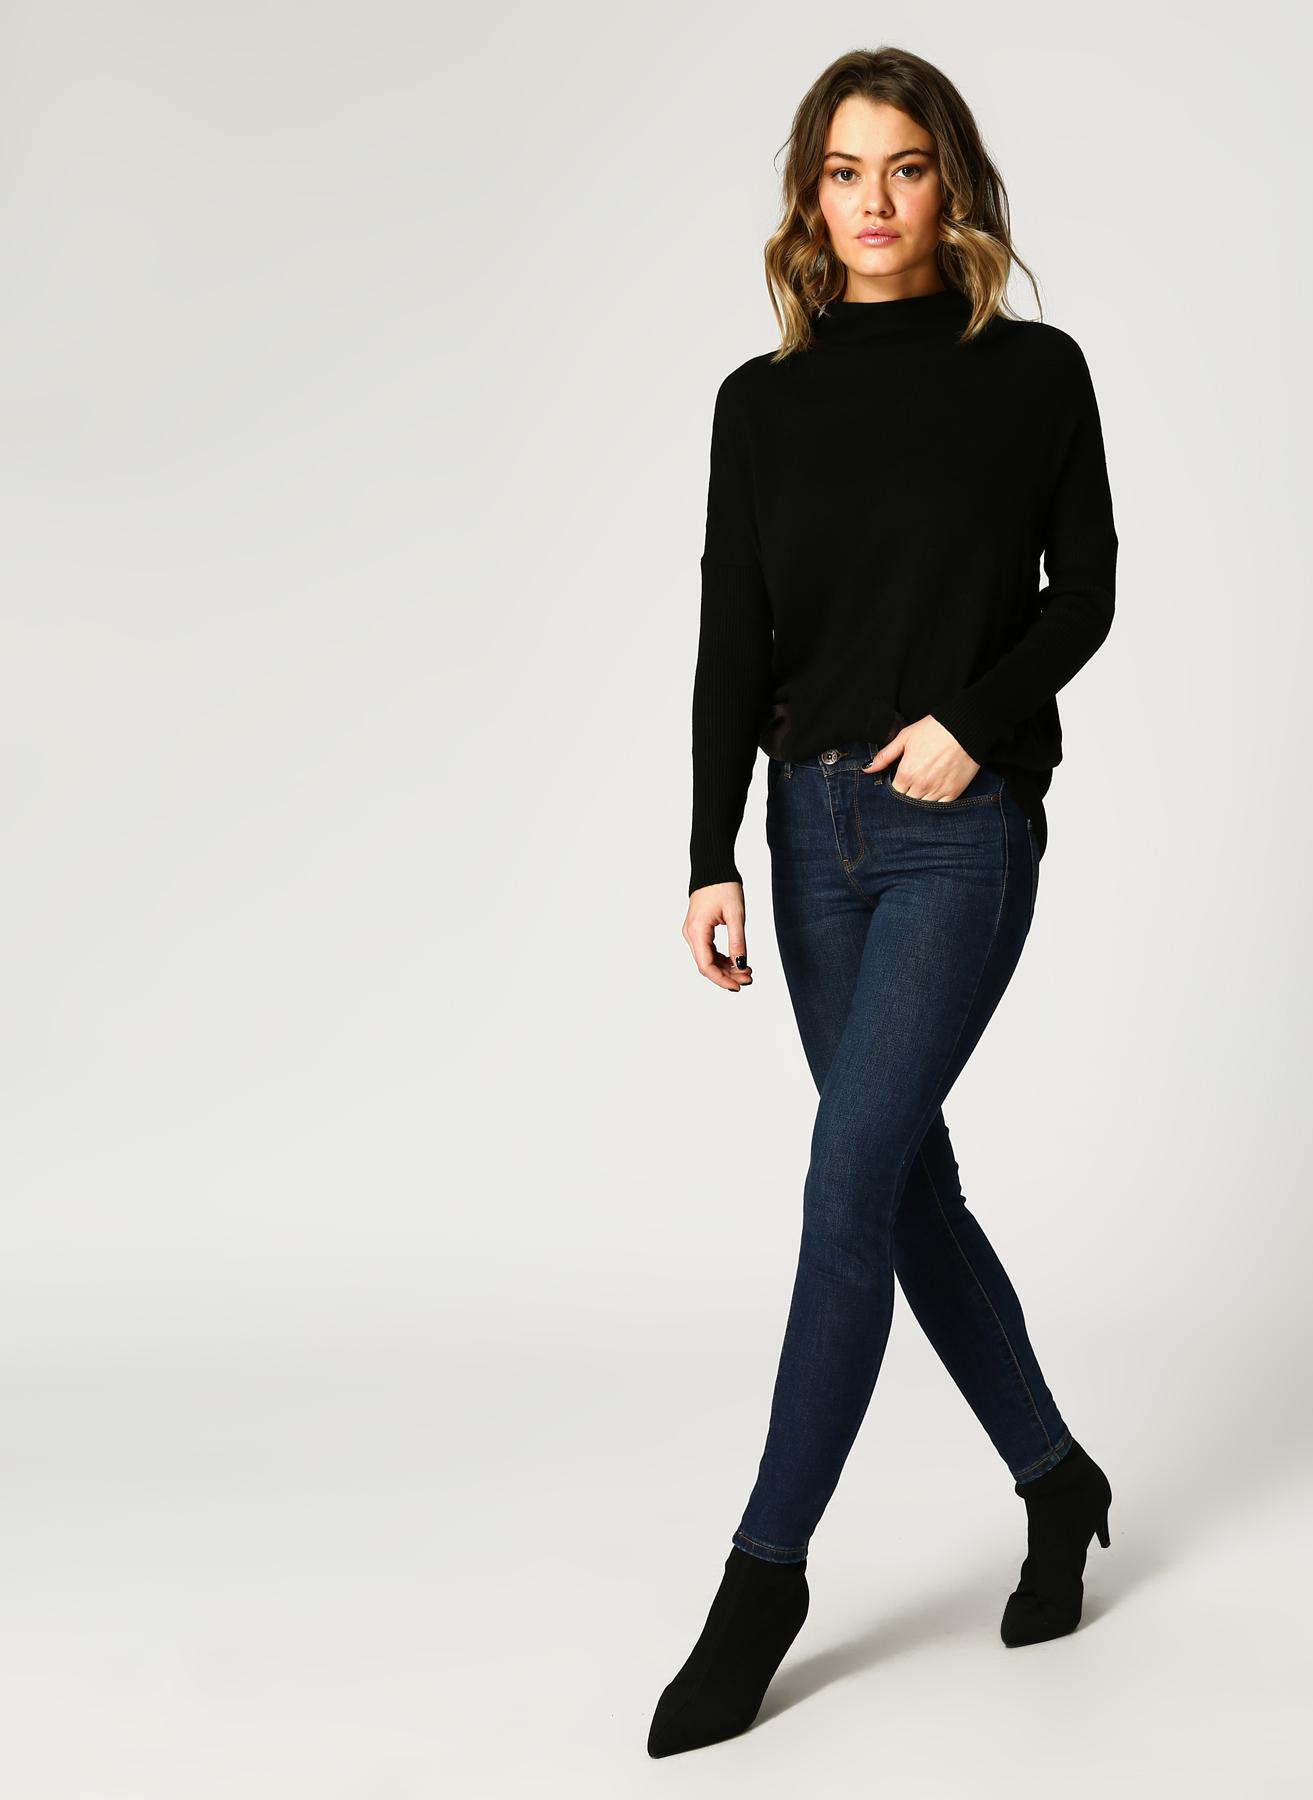 Vero Moda Mid Rise Slim Koyu Mavi Denim Pantolon 32-32 5001820895002 Ürün Resmi